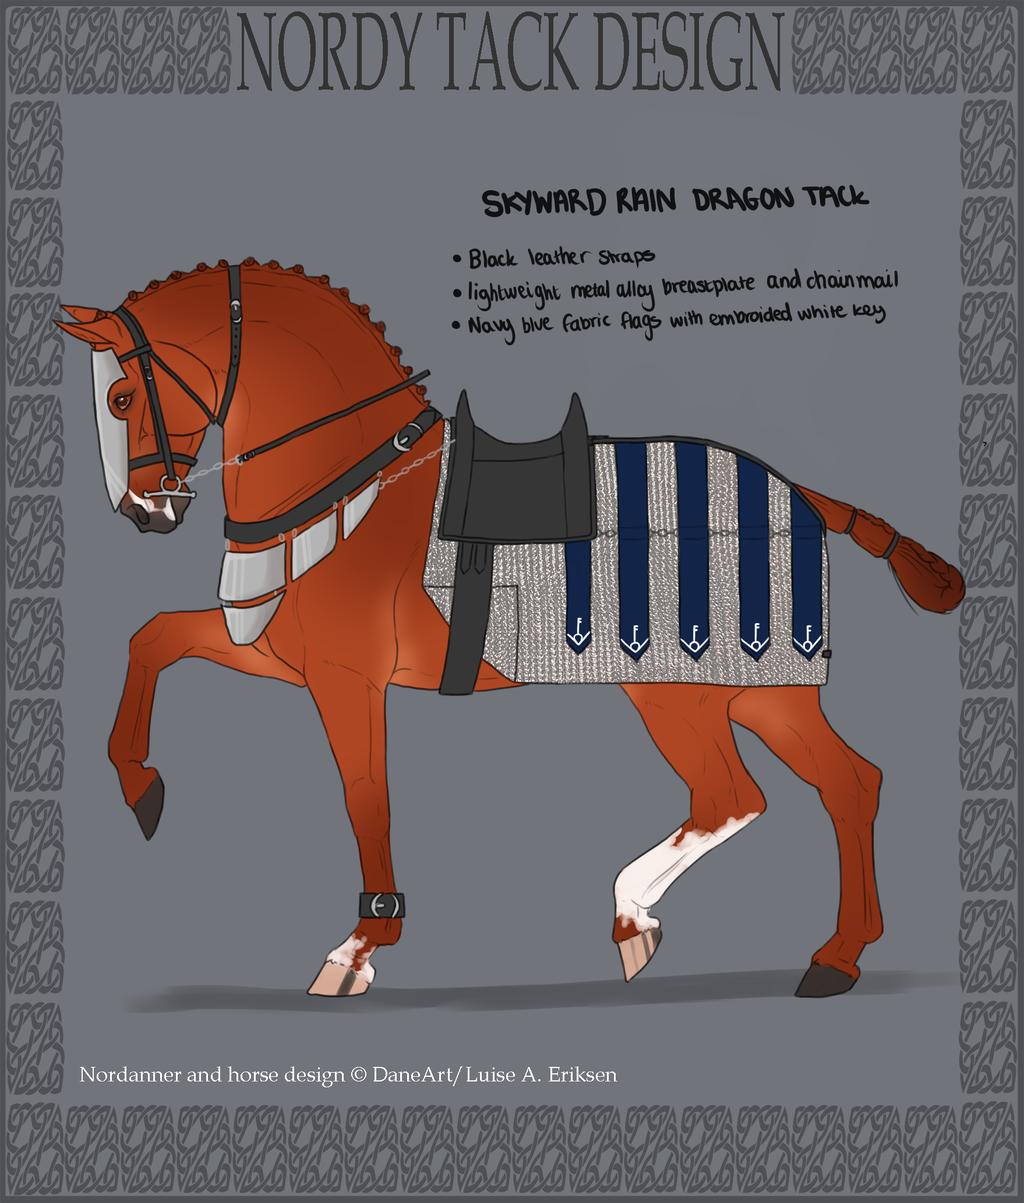 skyward rain dragon tack by horsy1050